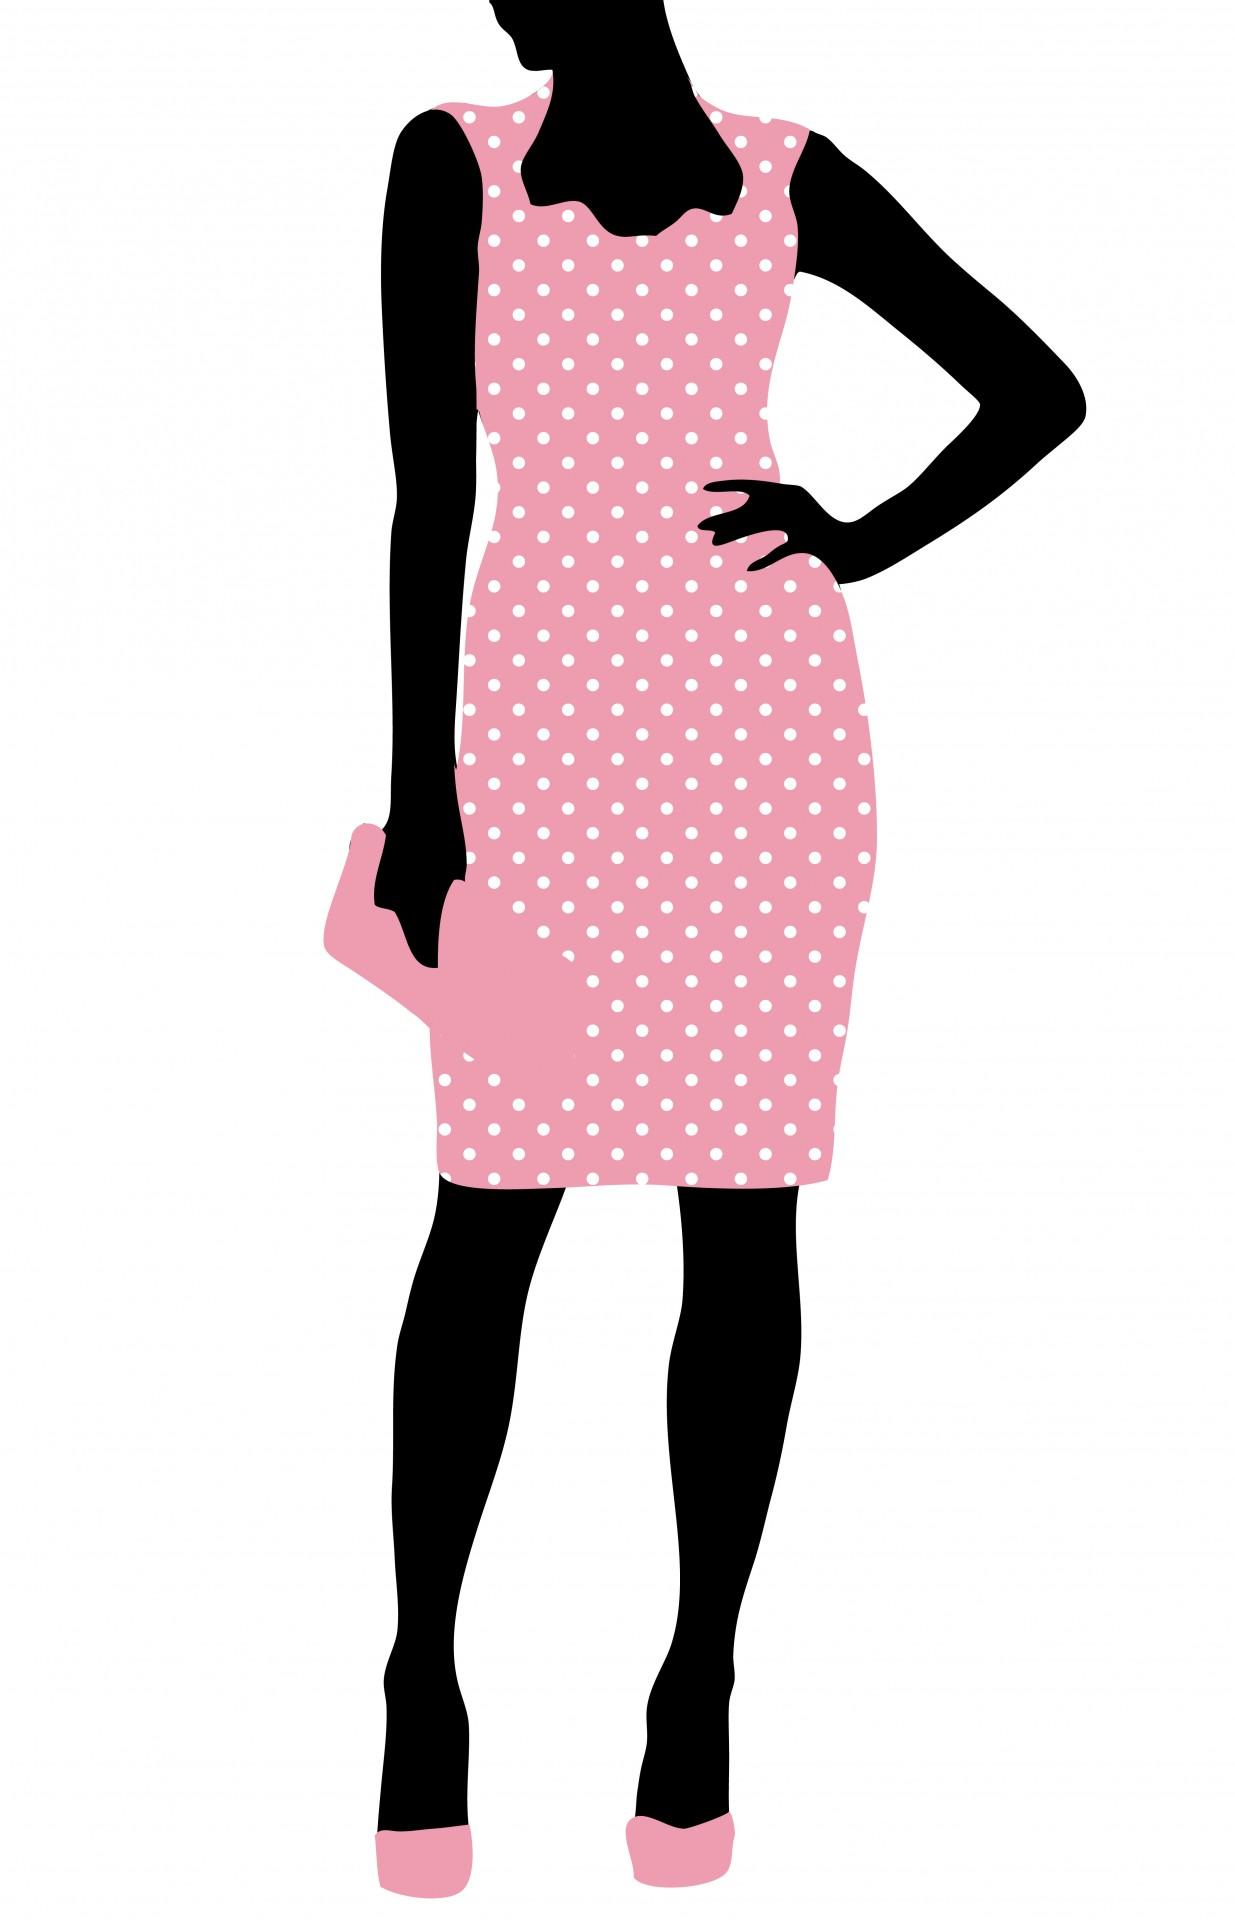 Fashion clipart. Woman free stock photo